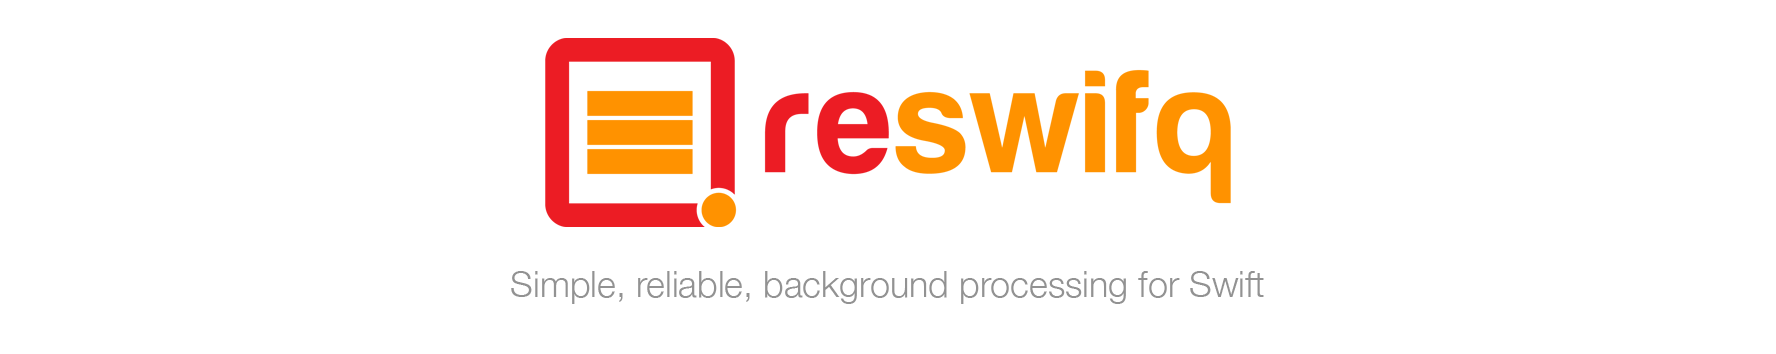 reswifq-github-header